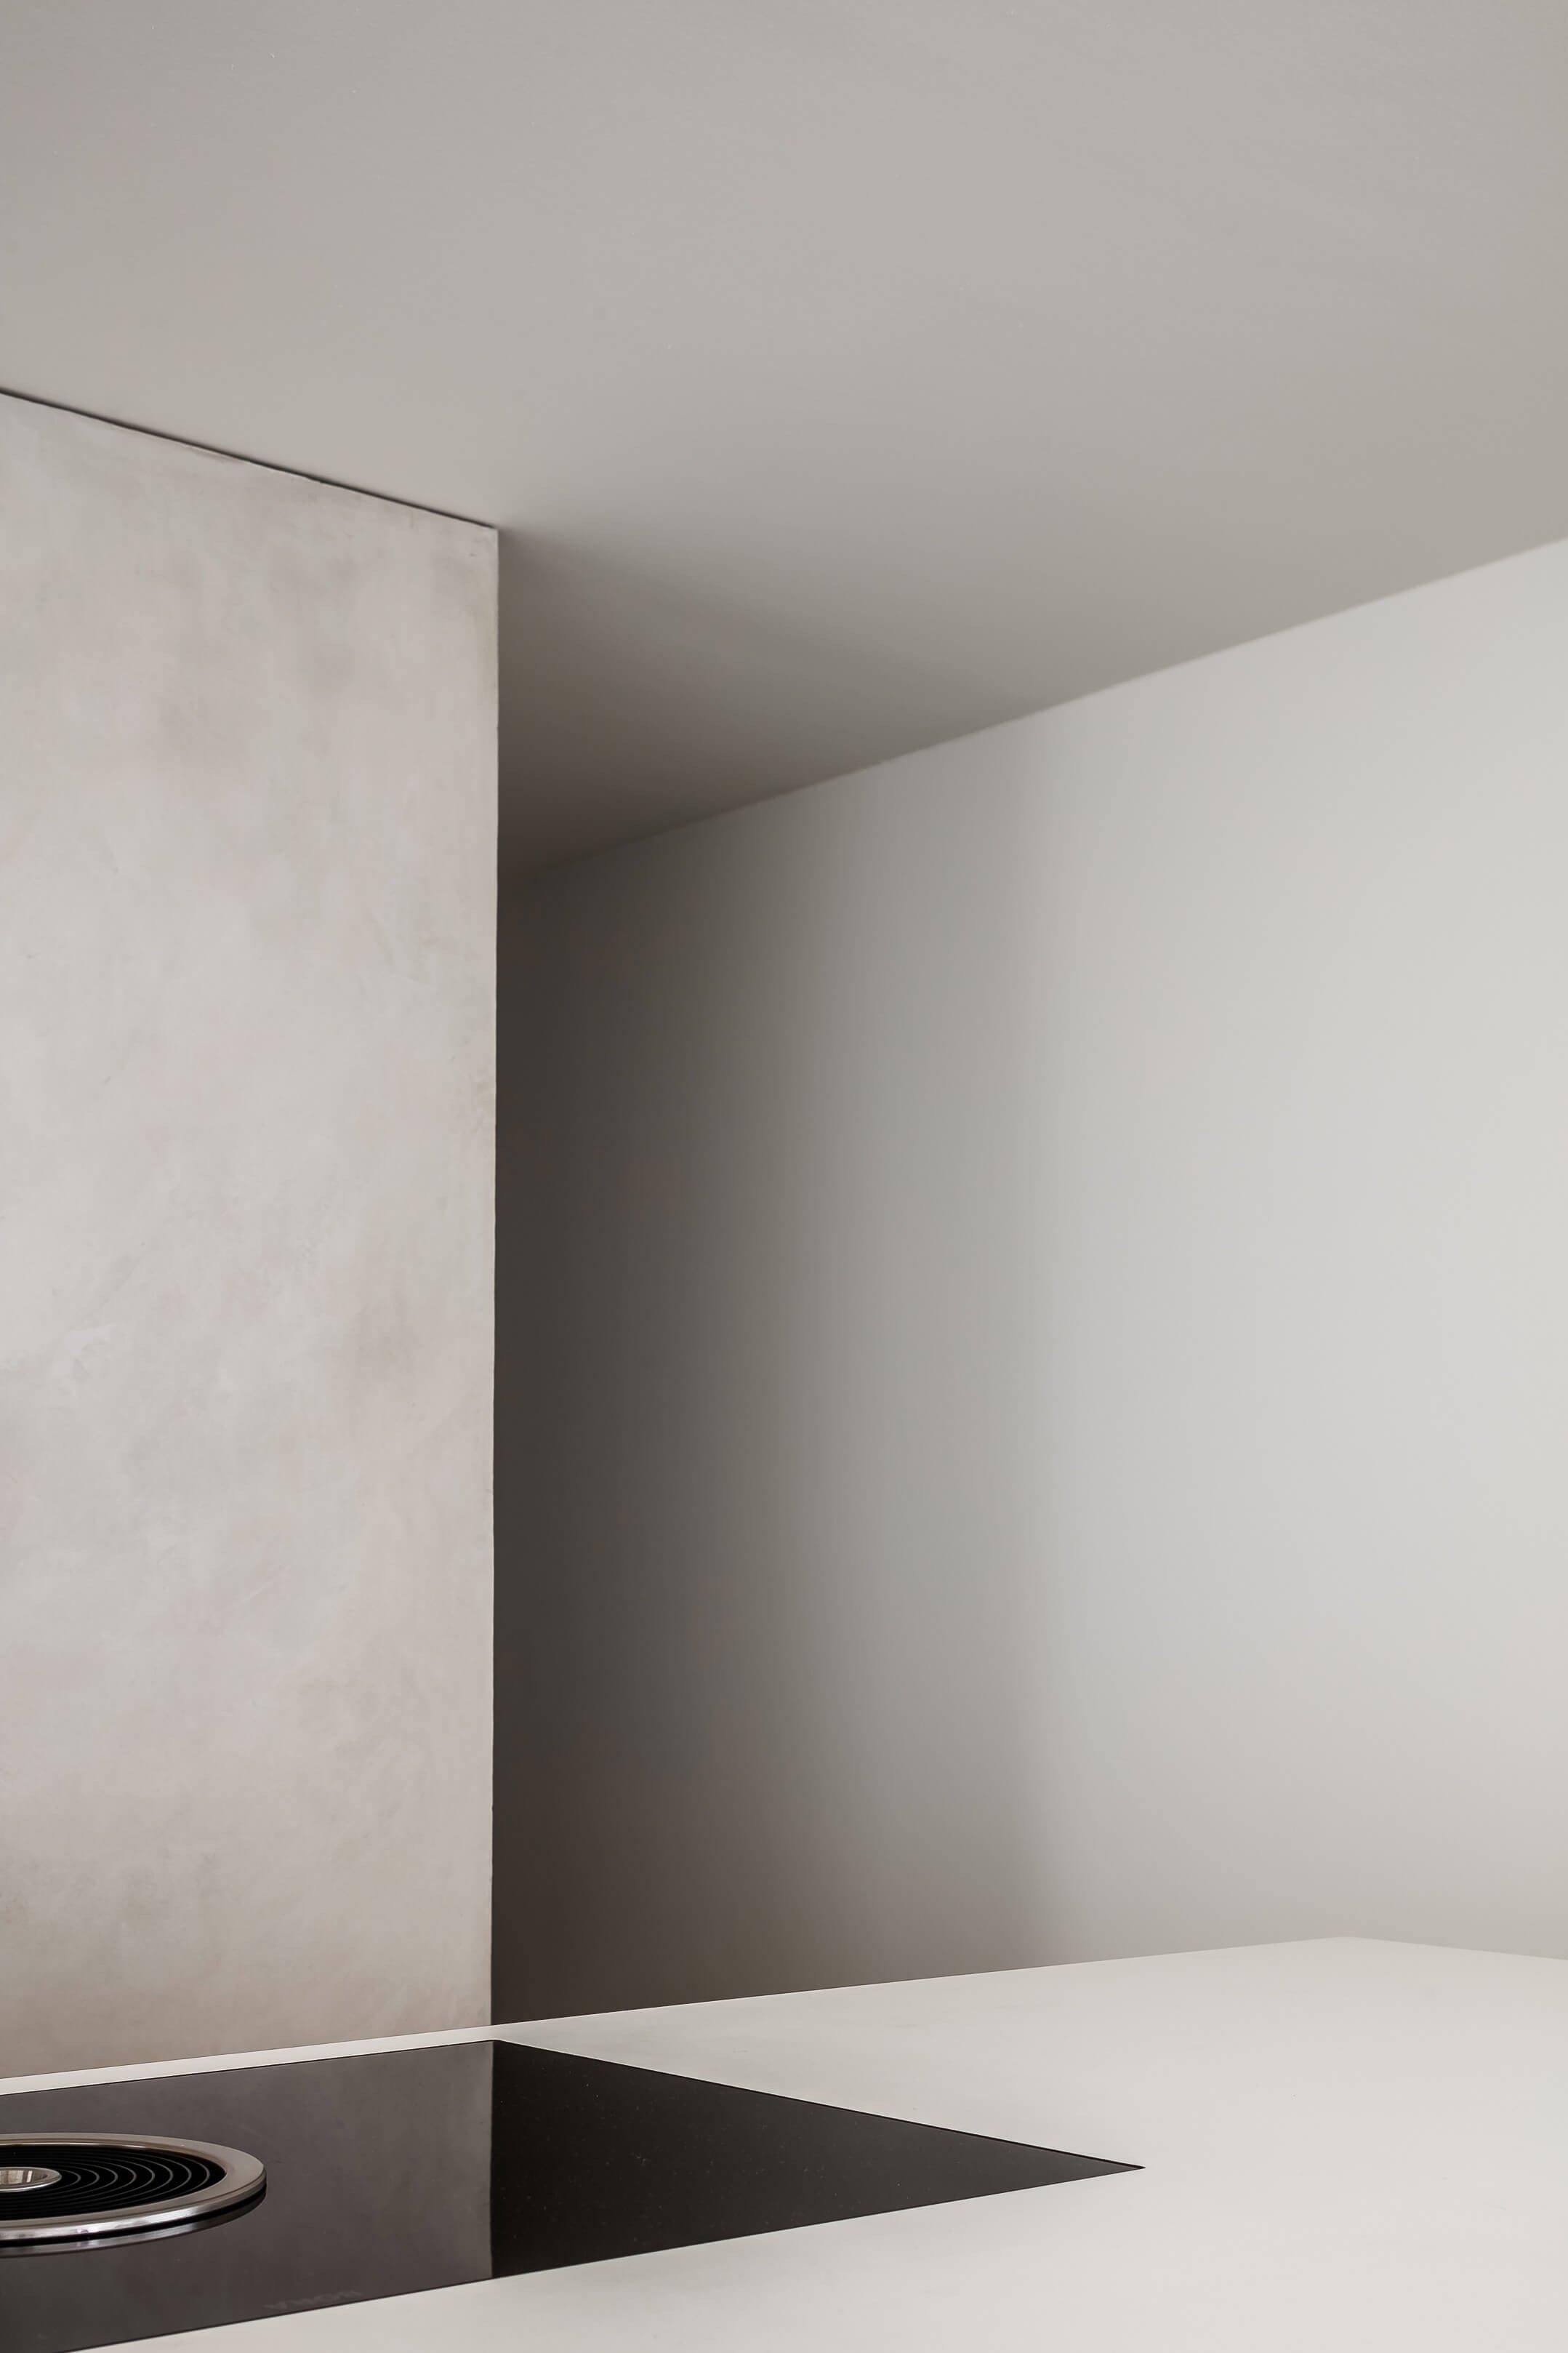 Rietveldprojects.be-five-am-rrr-odilon-creations-photobycafeine23.jpg